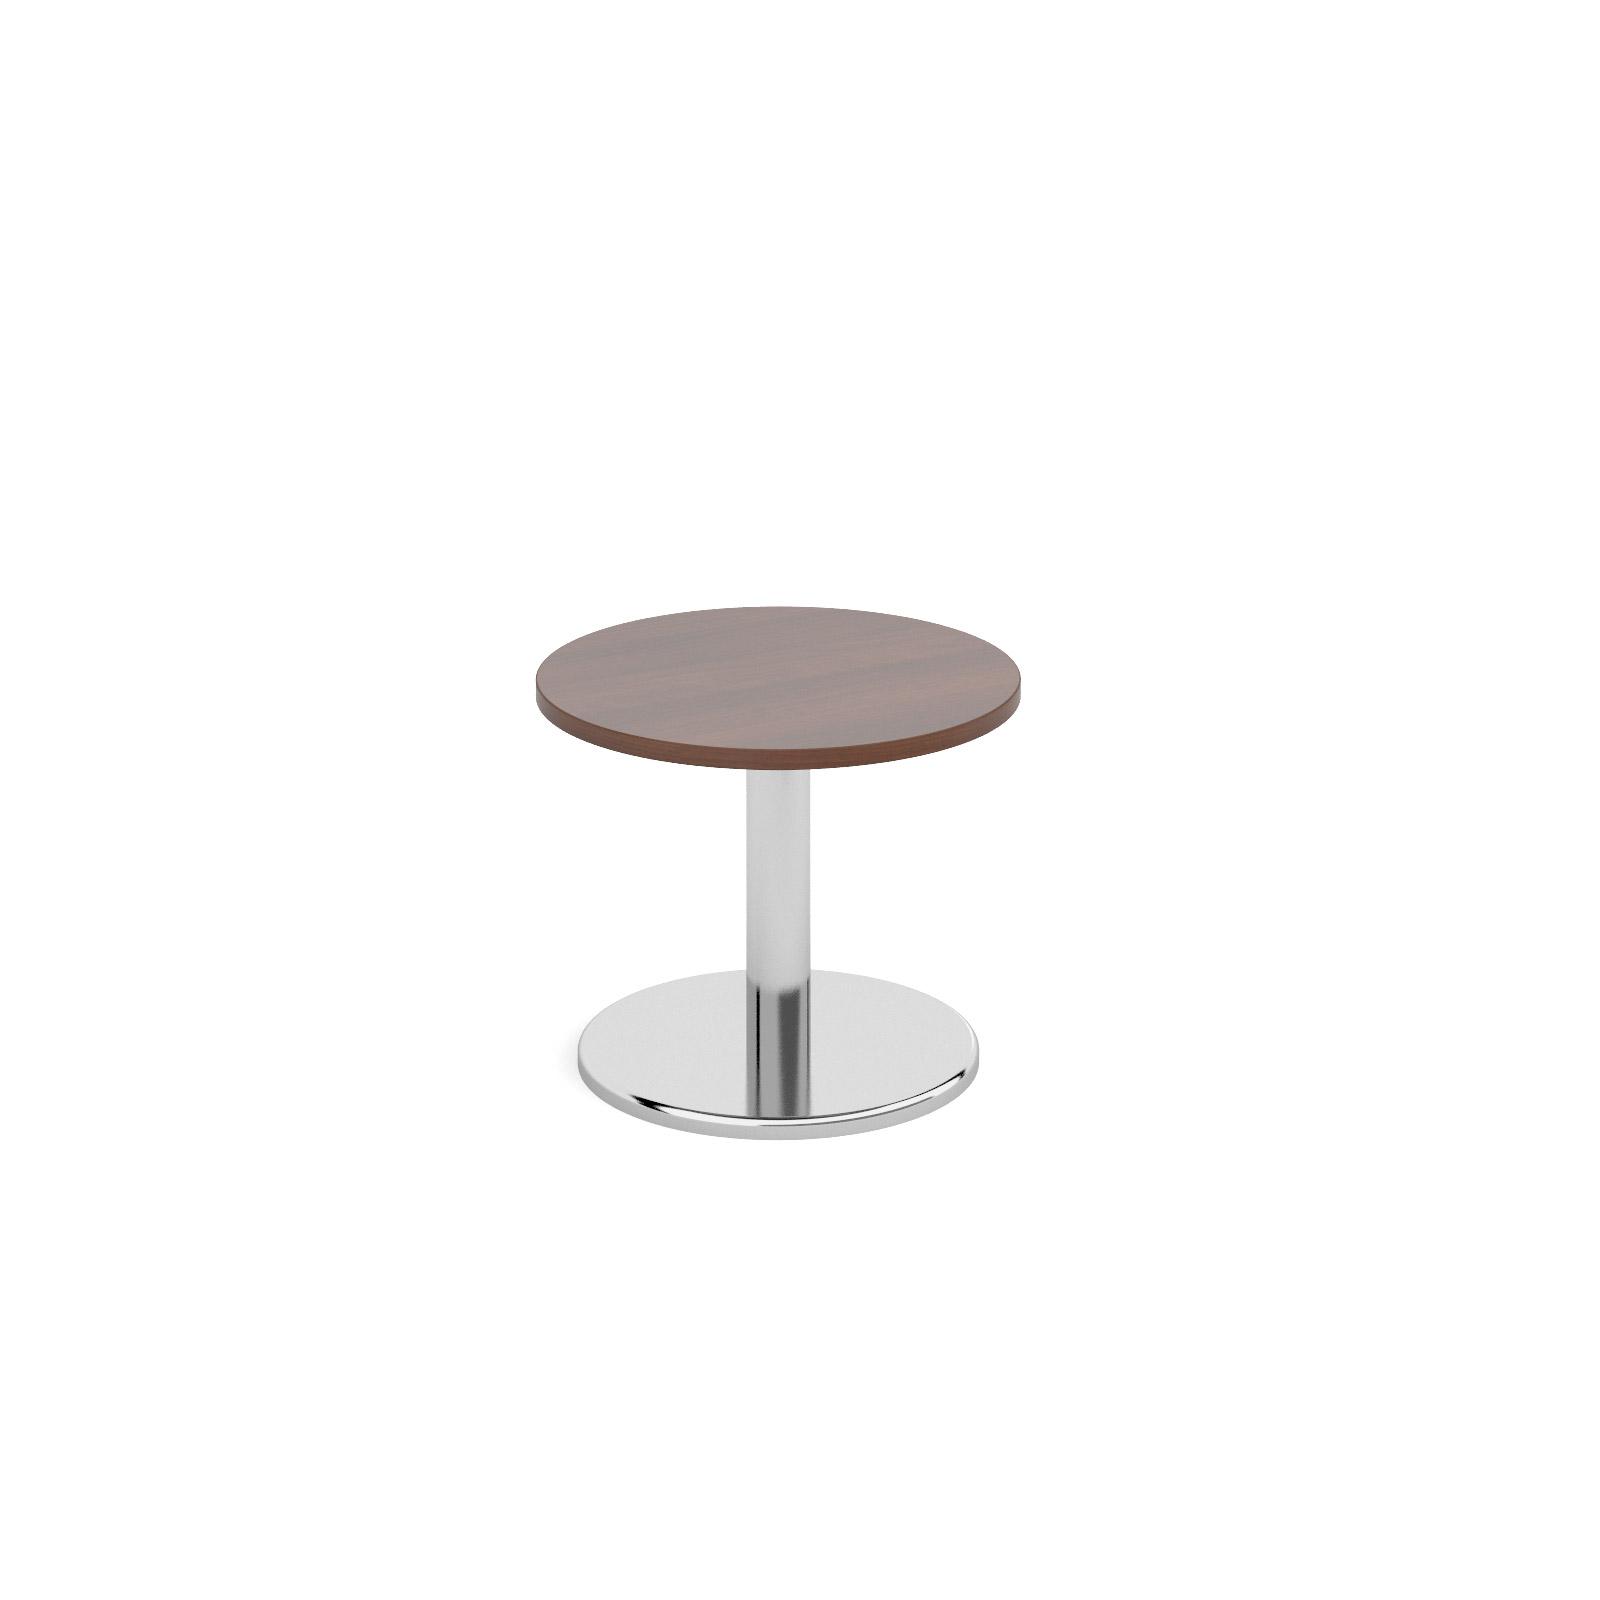 Circular coffee table with round chrome base 600mm - walnut